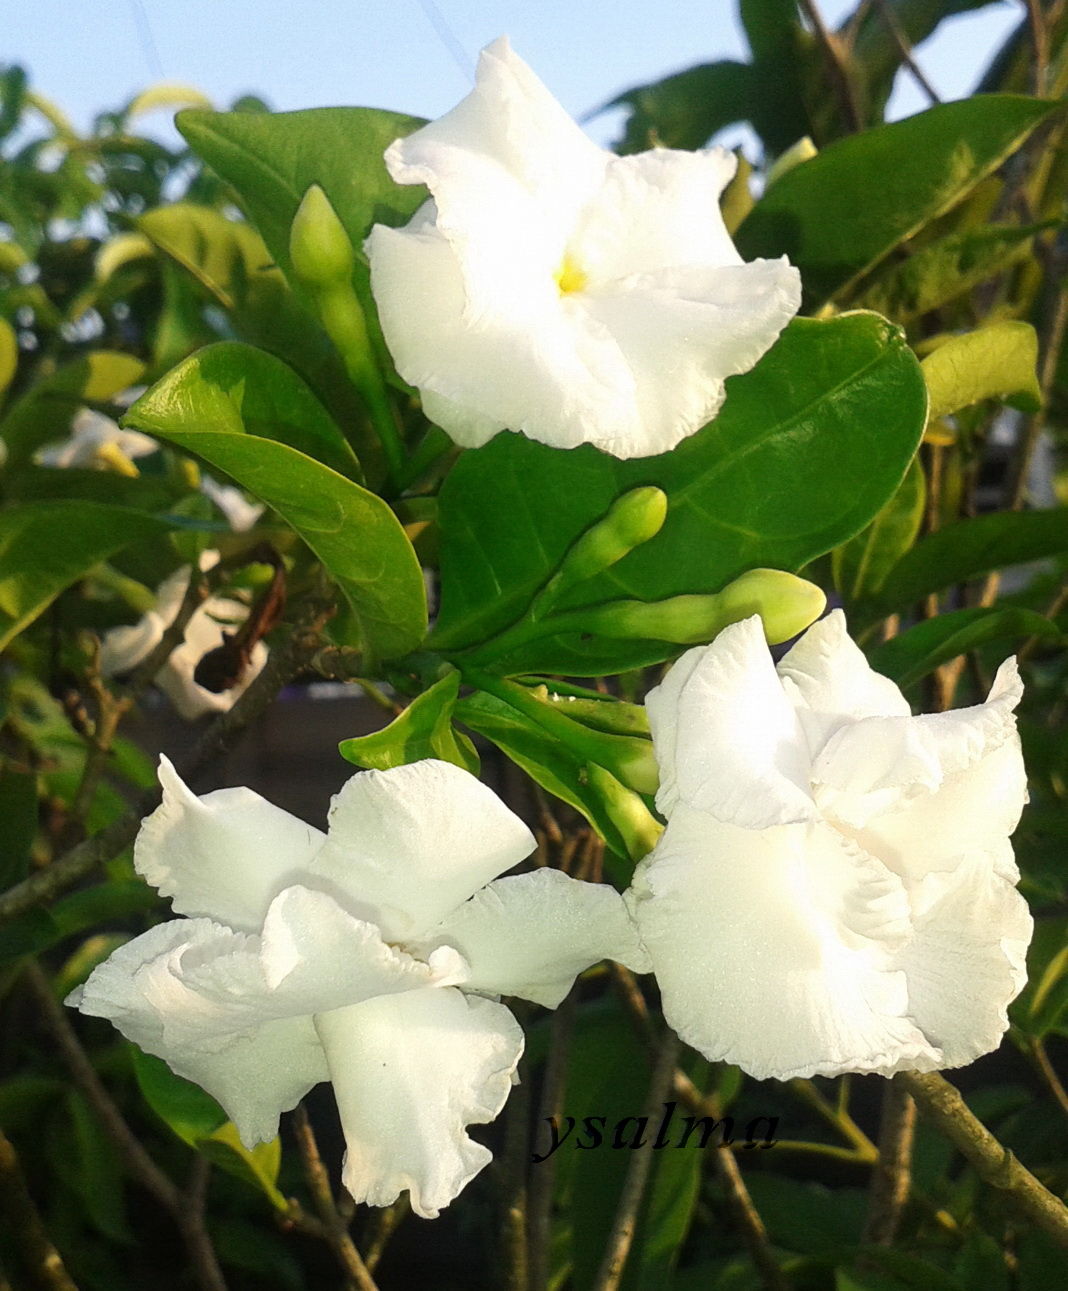 Rahmi pratiwi biologi 14 httpsysalmaleswordpress201404bunga putih kaca piringg ccuart Image collections